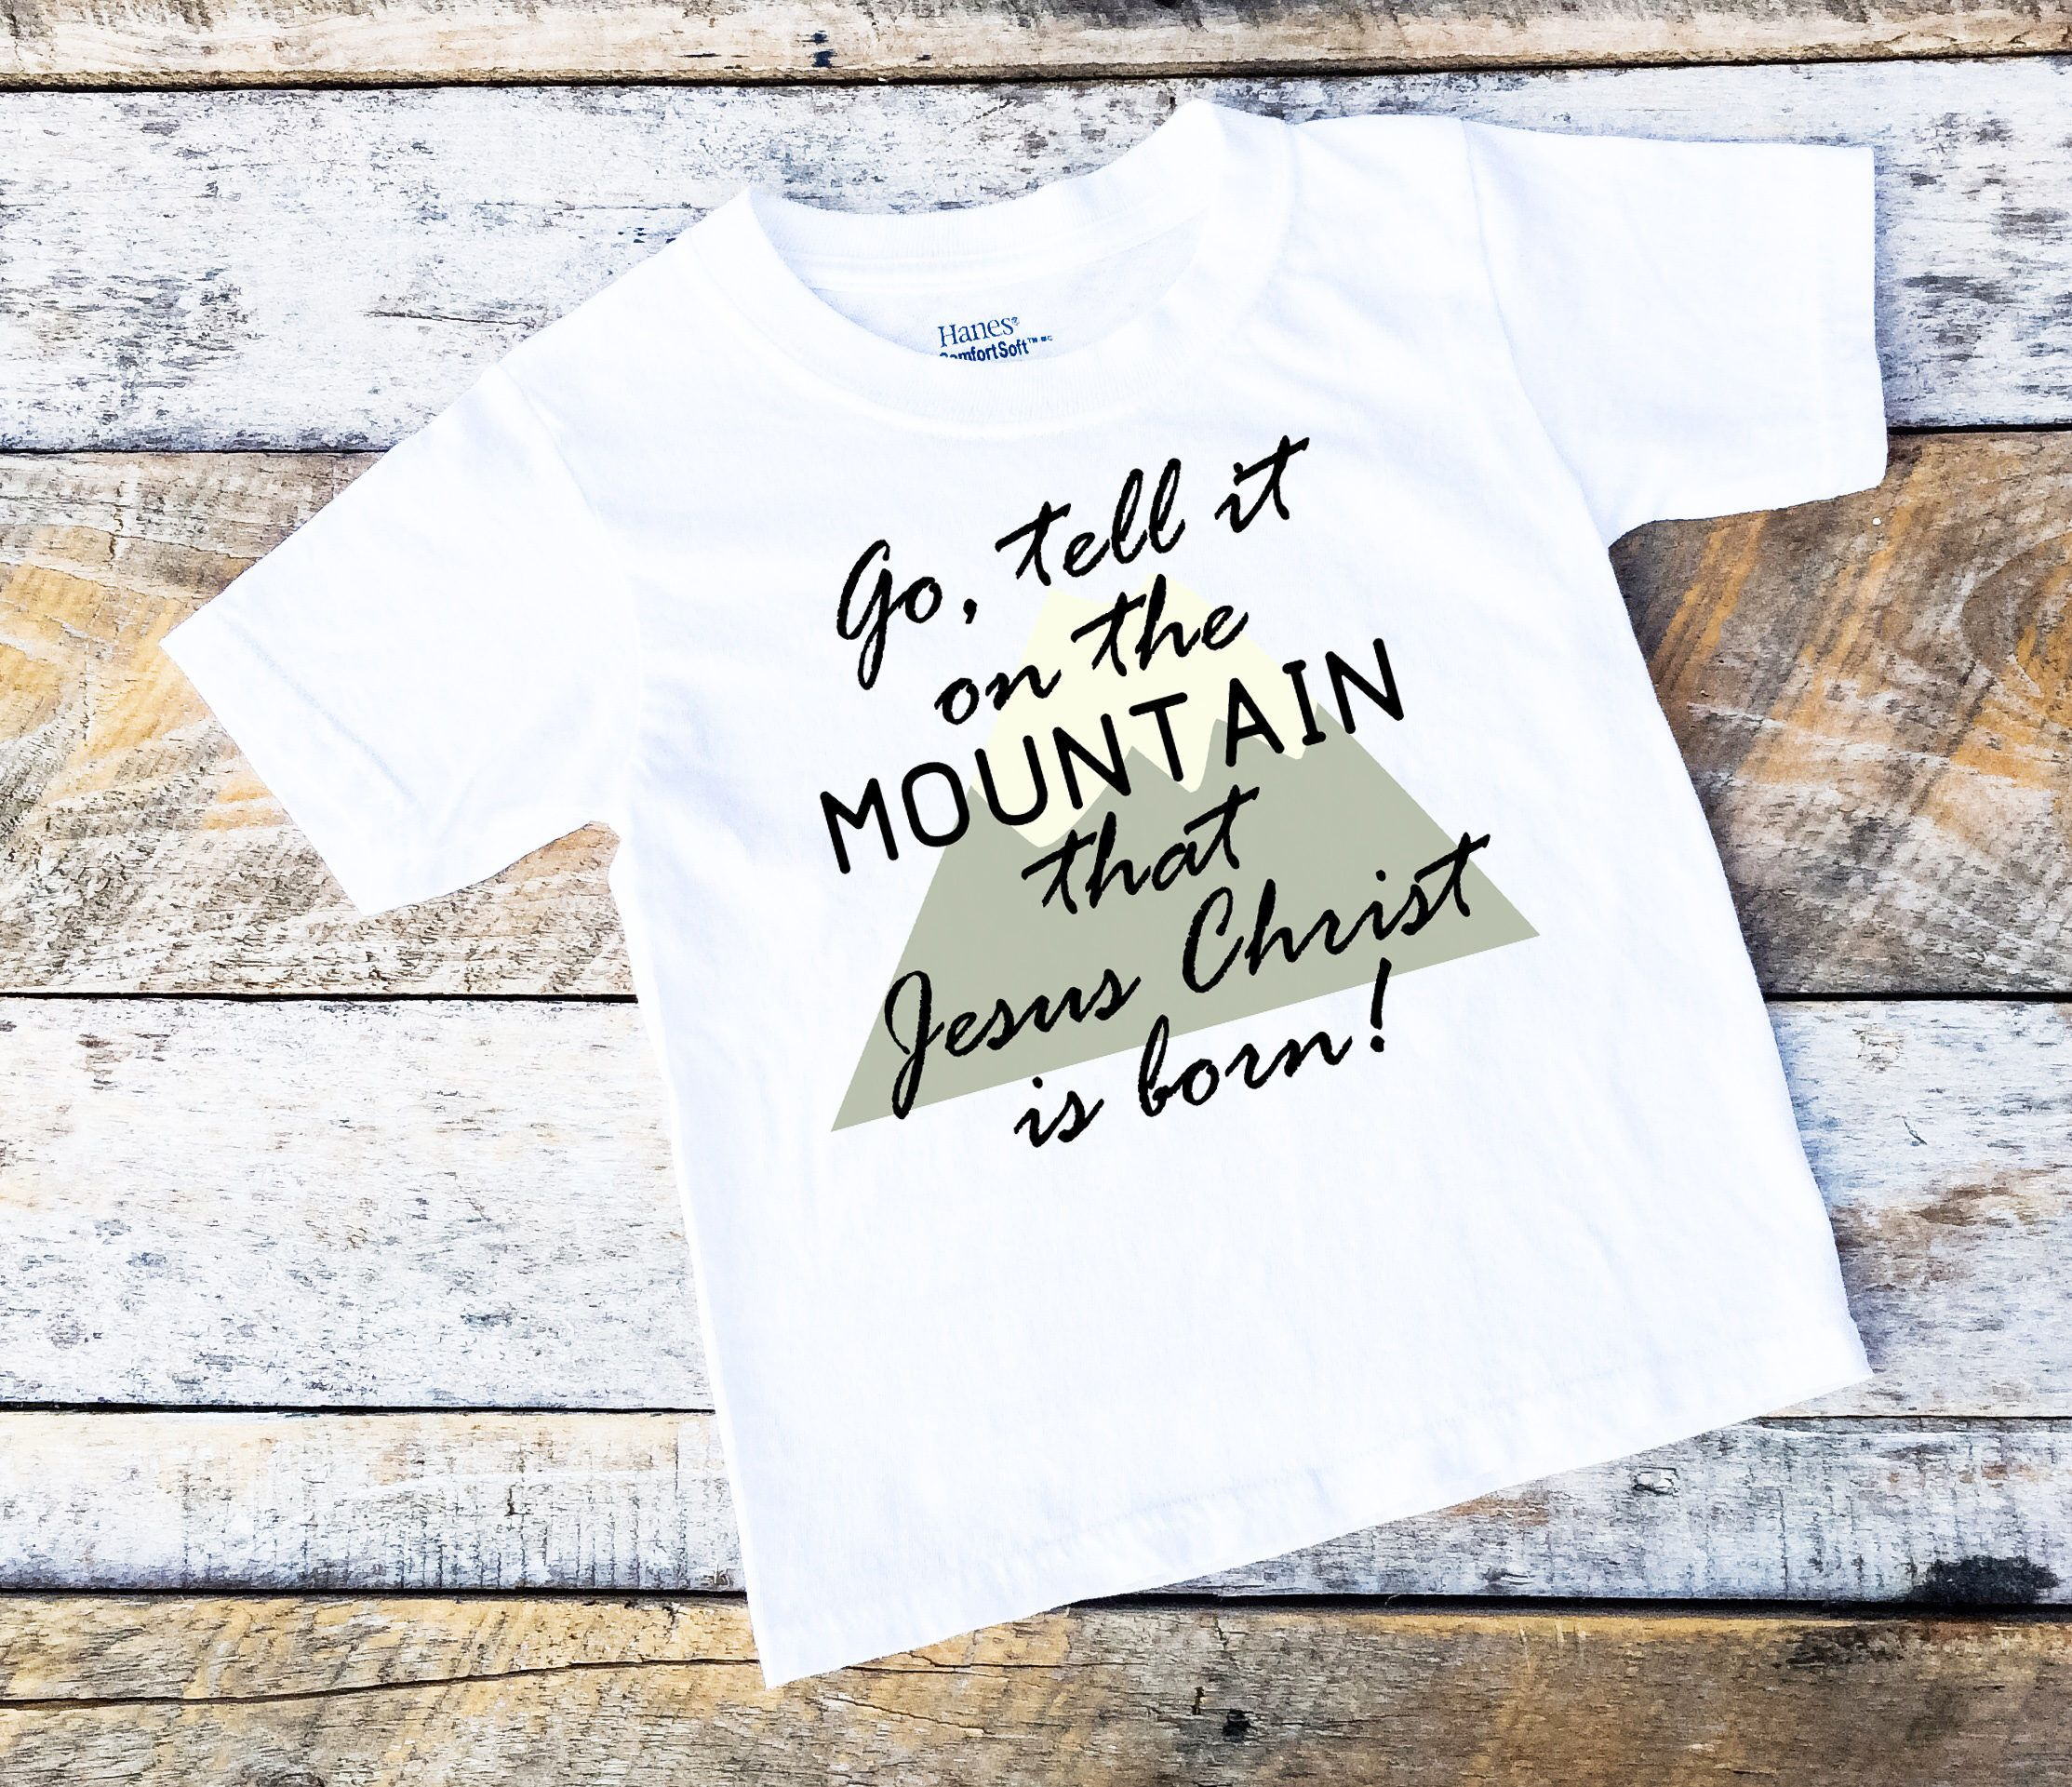 Christmas Onesies® For Boys, Go Tell it on the Mountain Onesie ...